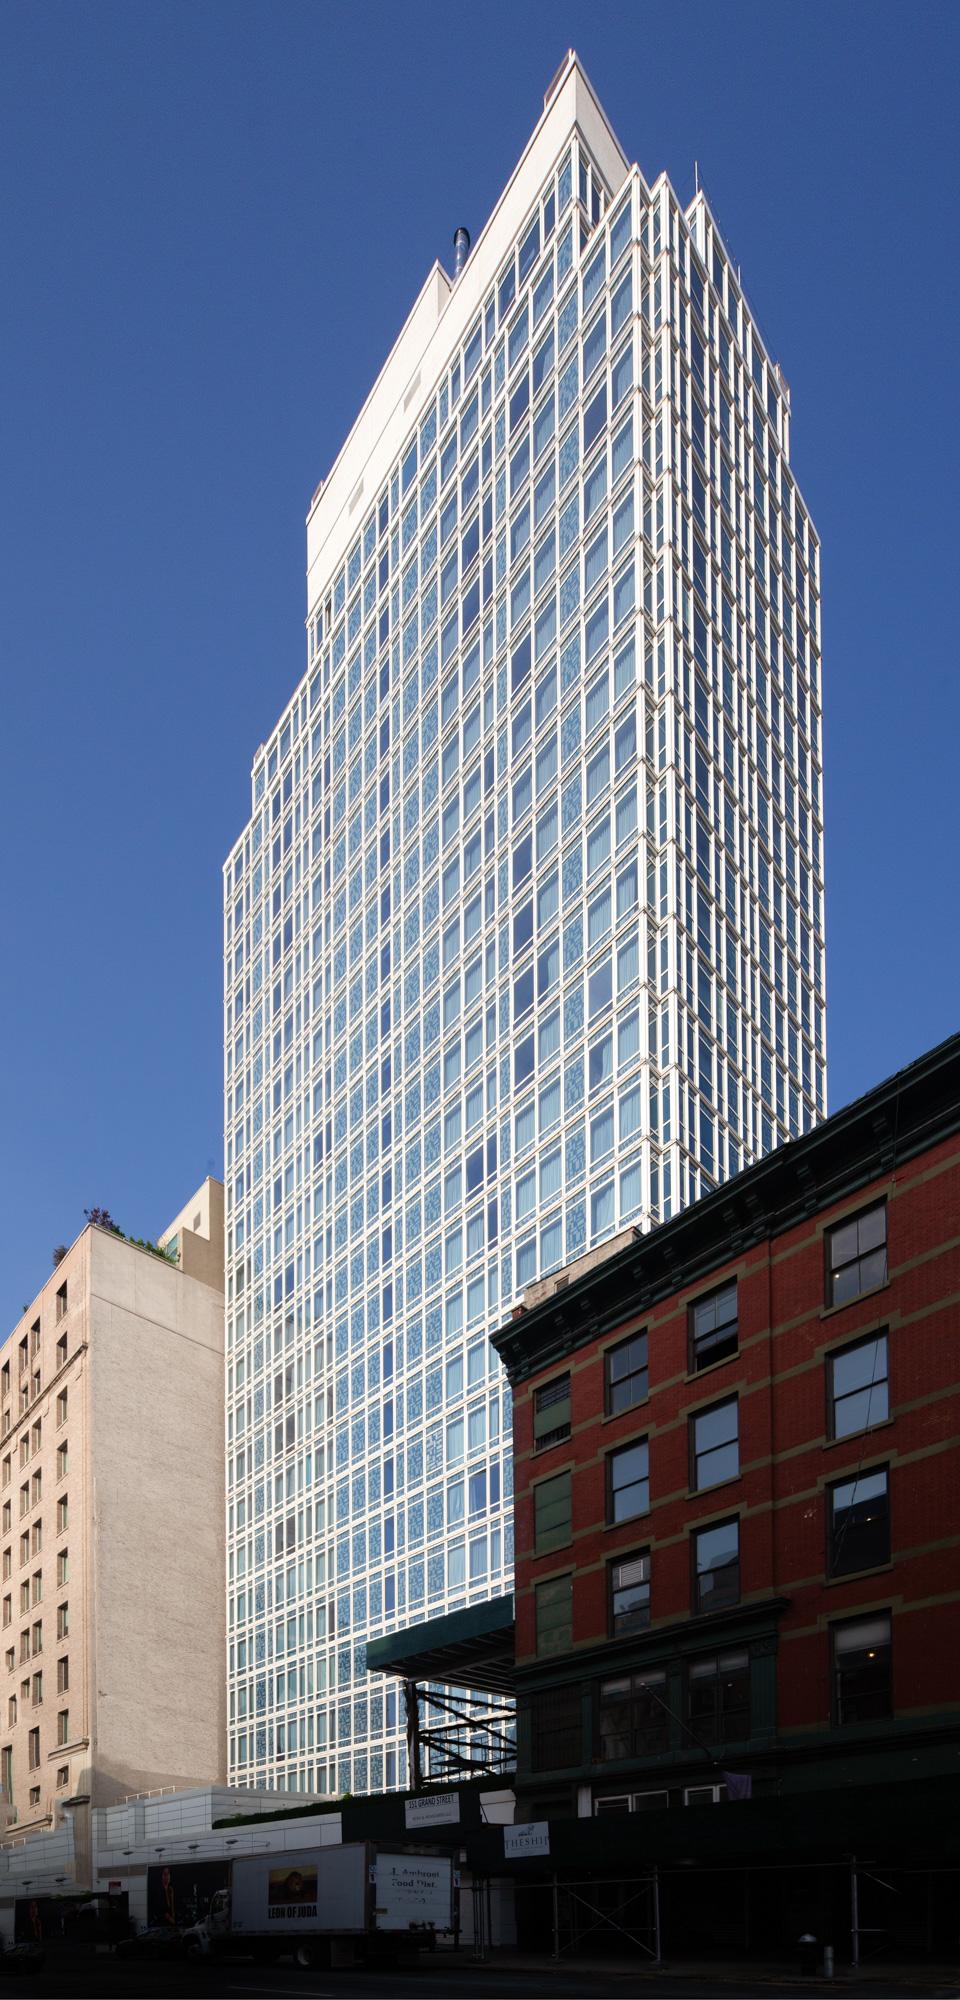 The Mondrian Hotel, New York